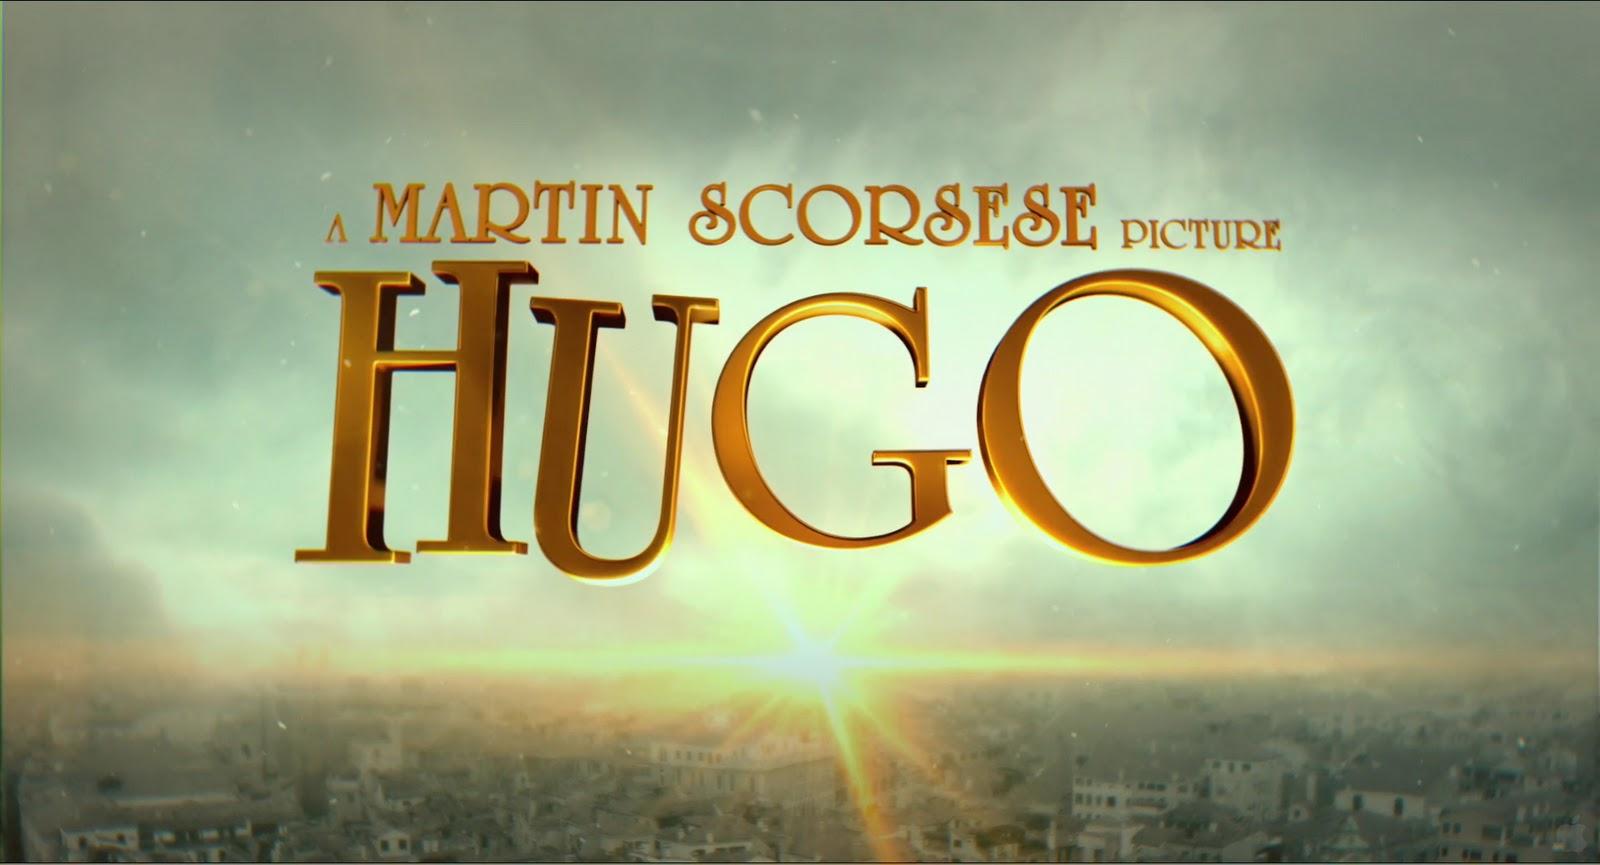 Hugo B